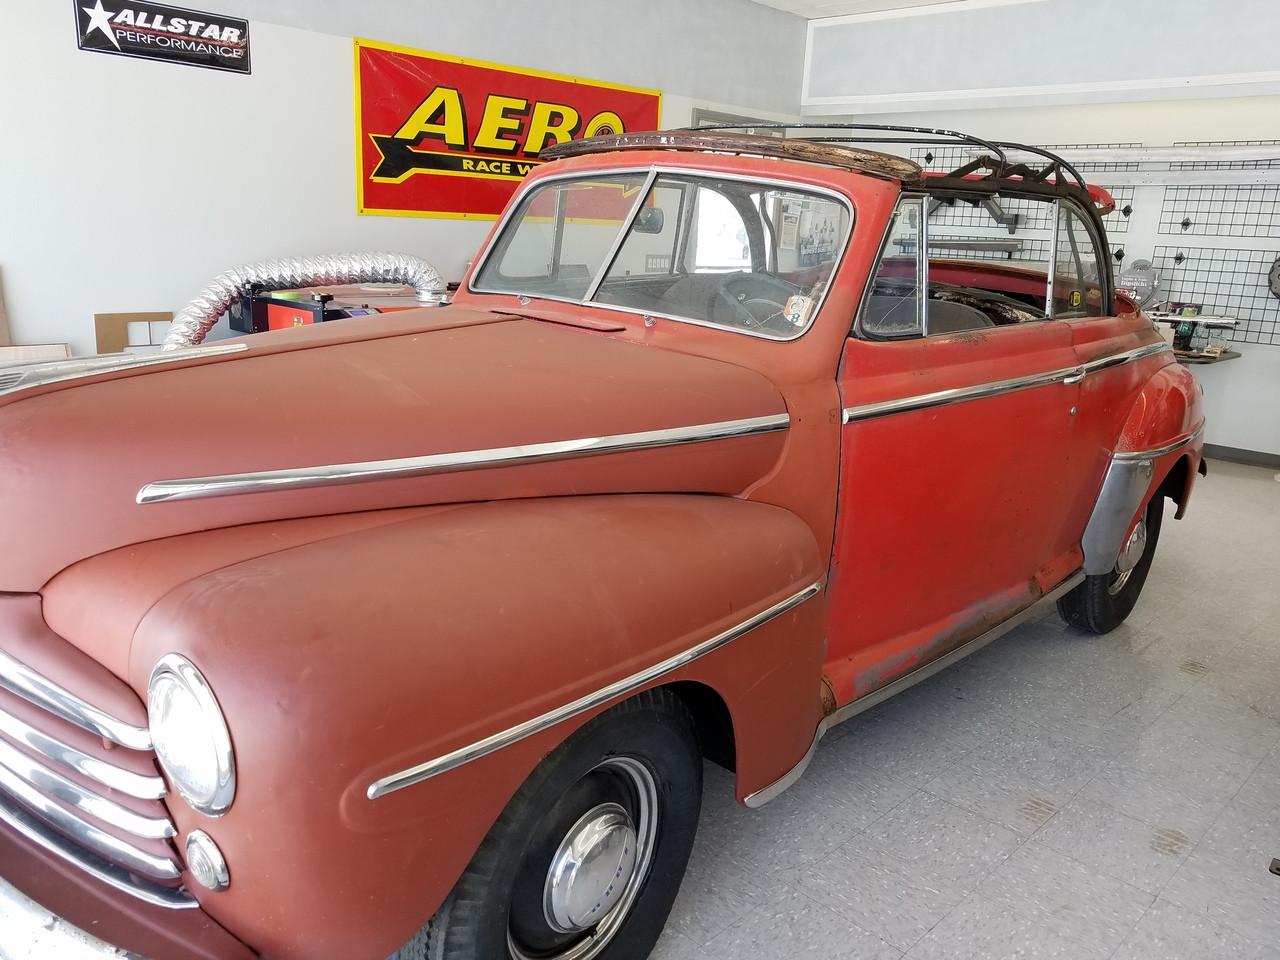 1941-1948 Ford Passenger Car S-10 Conversion Kit - Code 504, LLC